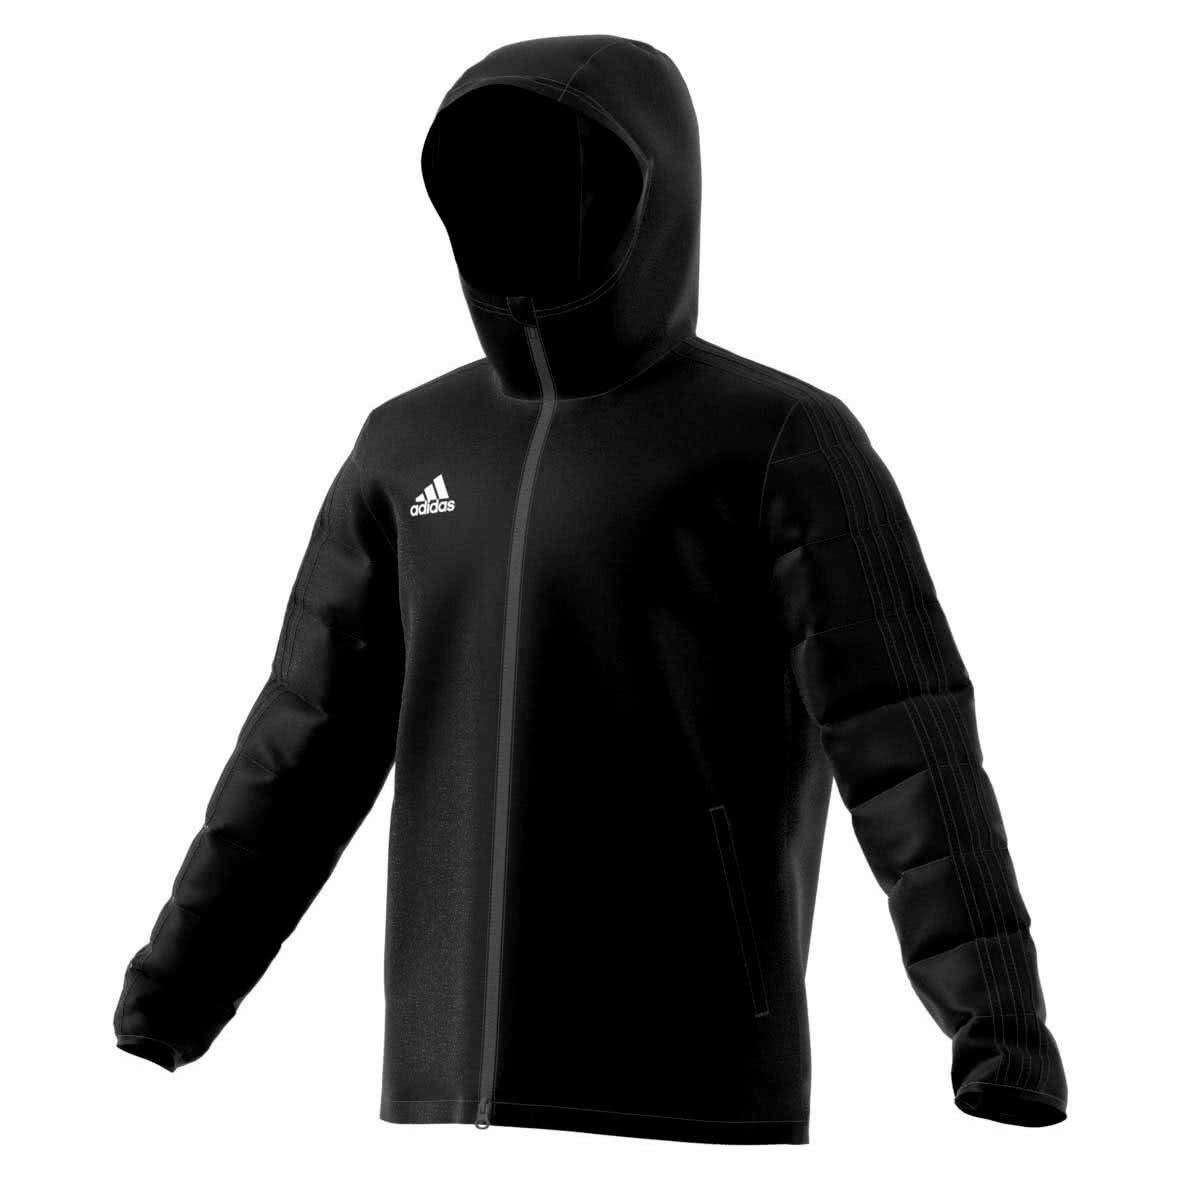 Details zu adidas Kinder Outdoorjacke Winterjacke Jacke